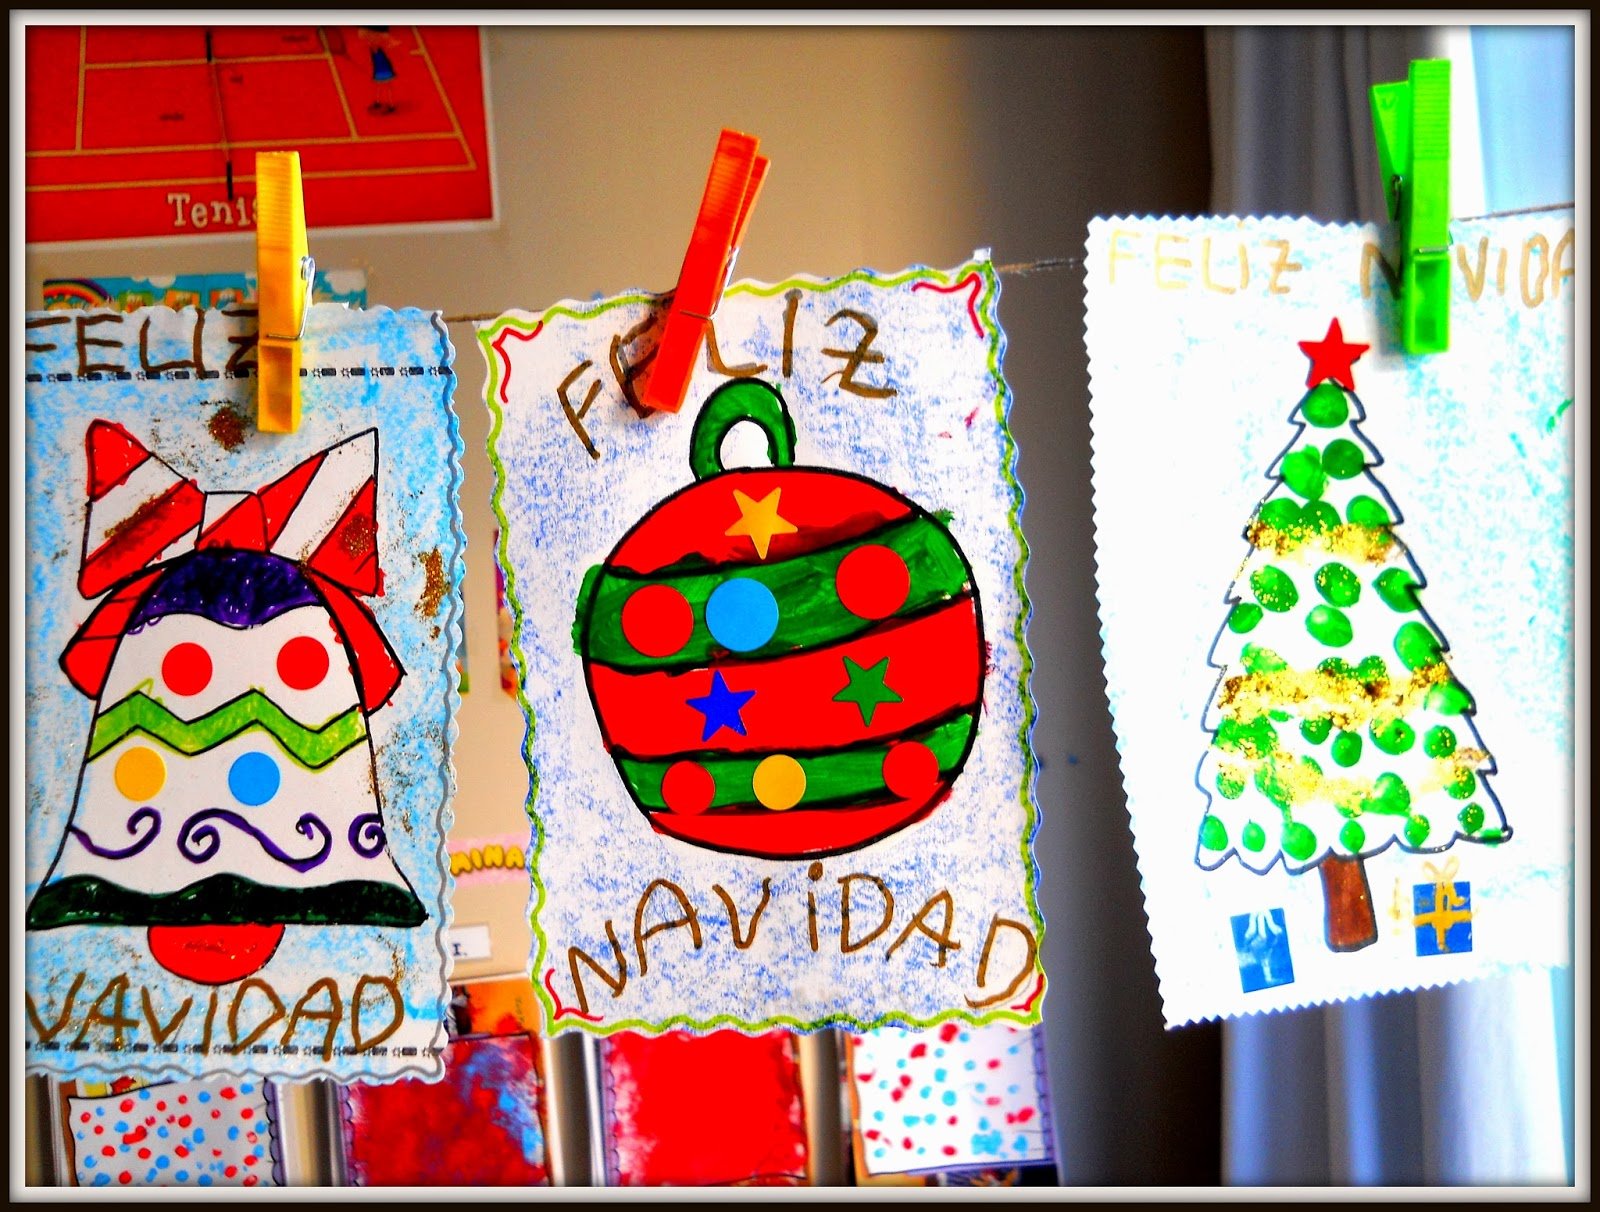 Infantil en ribadesella decoraci n navide a - Decoracion navidena infantil ...